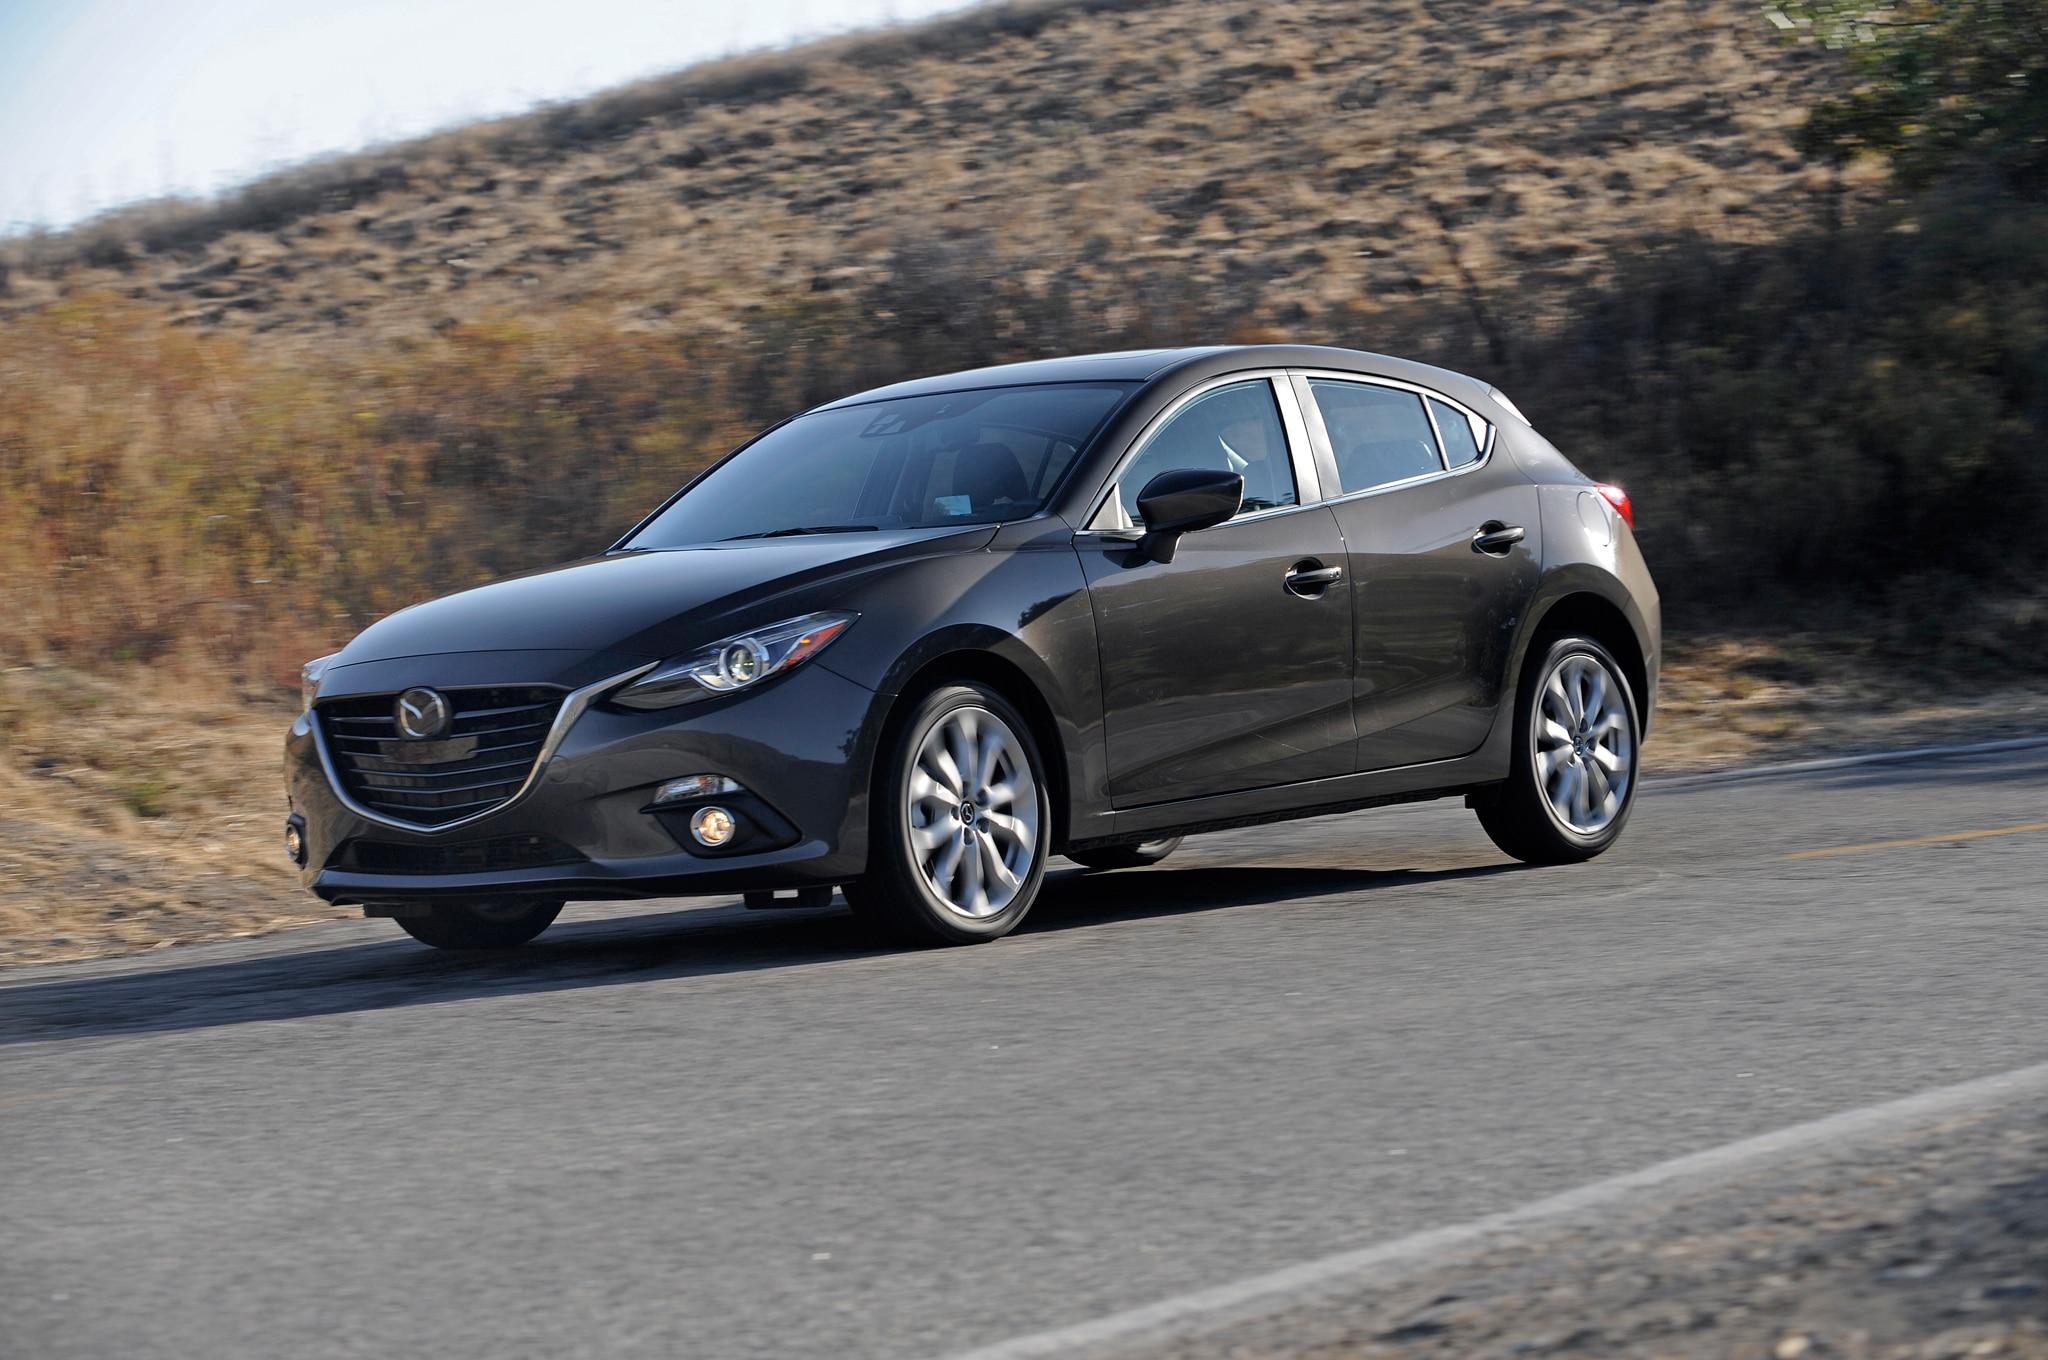 2014 Mazda3 Front Three Quarter1